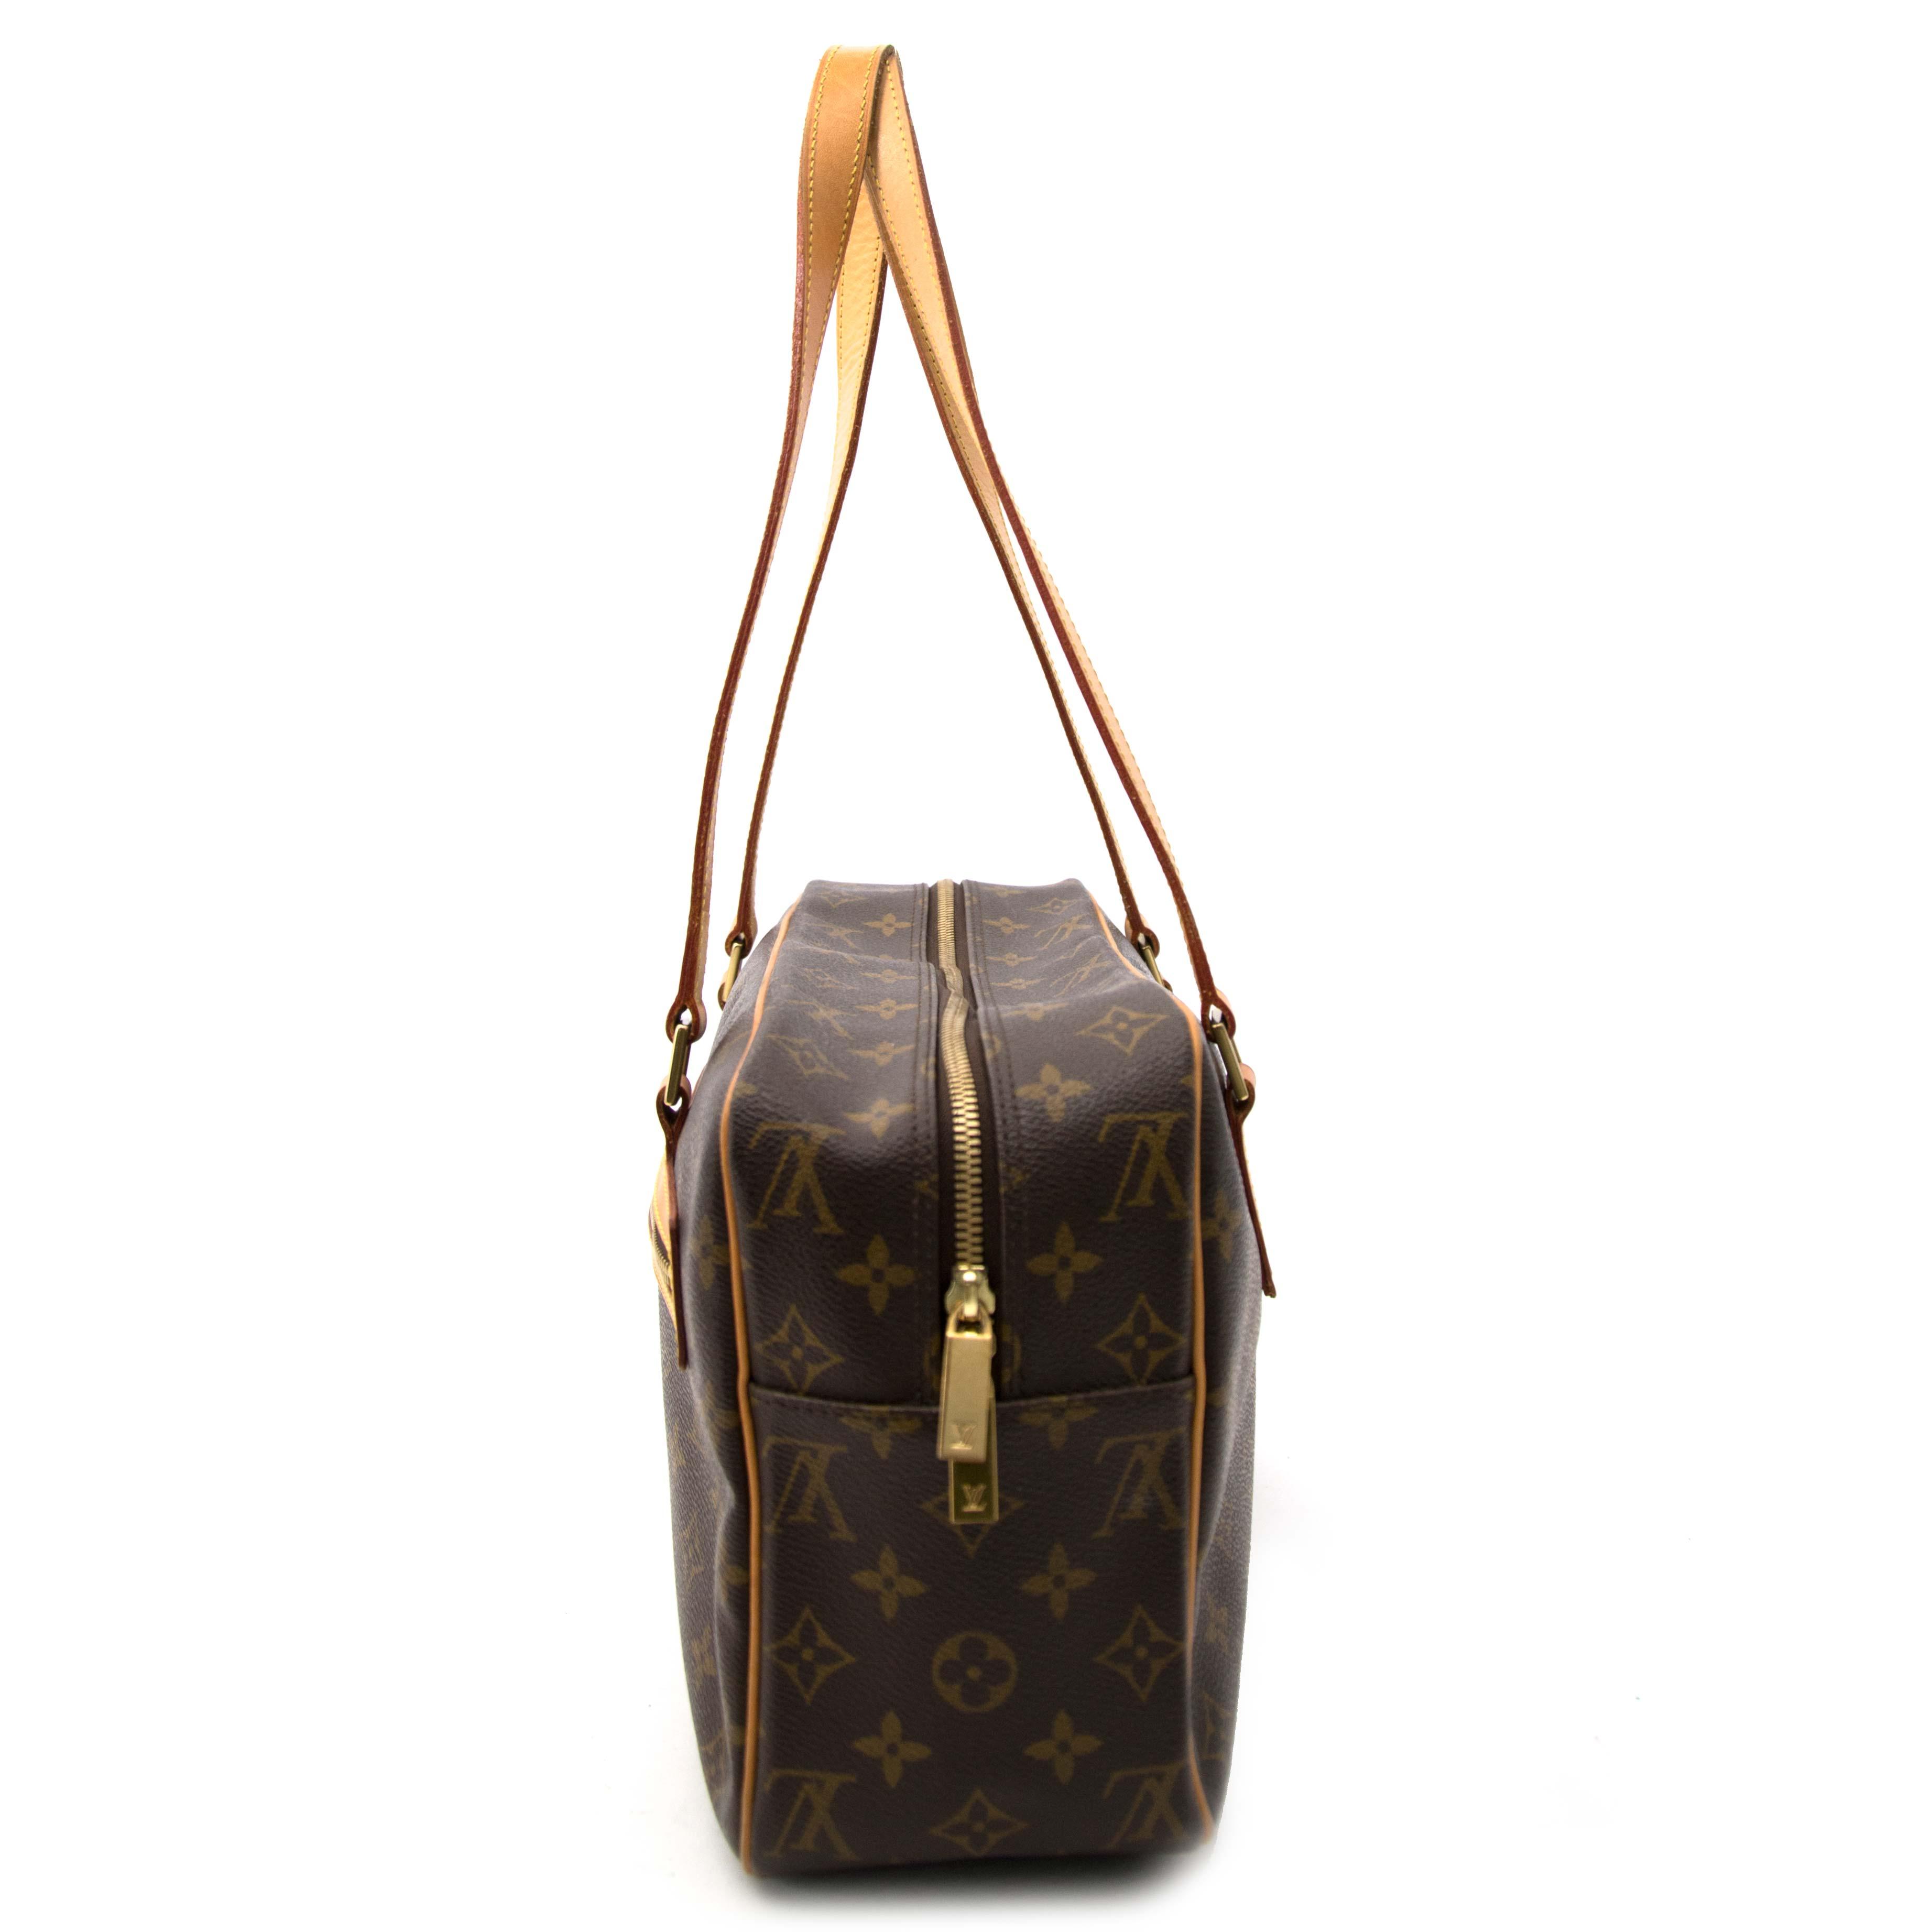 looking for a secondhand Louis Vuitton Monogram Shopper